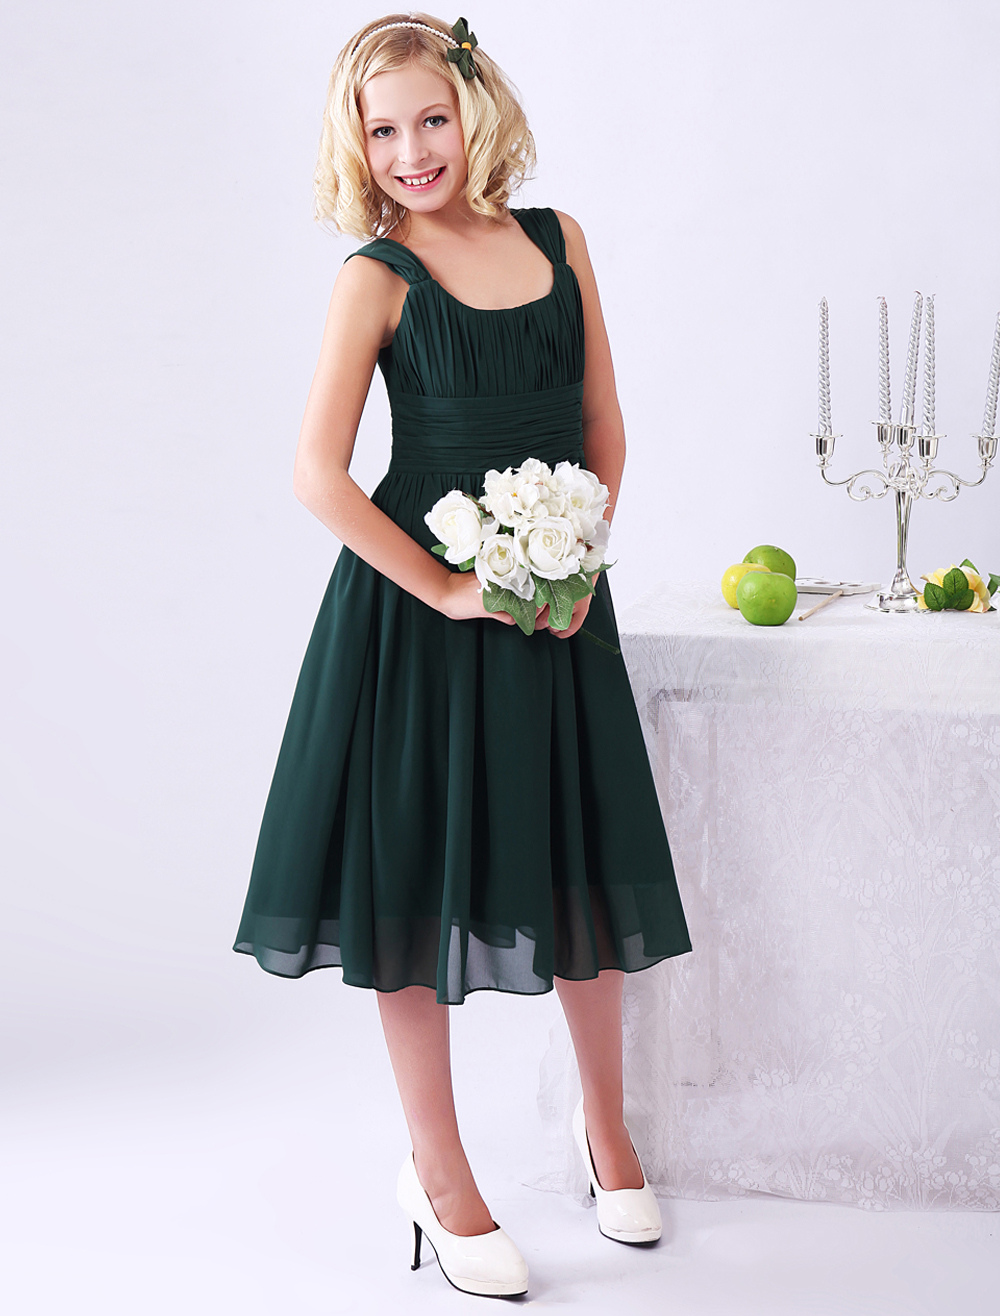 Dark Green A-line Ruched Chiffon Junior Bridesmaid Dress with Square Neck (Wedding) photo